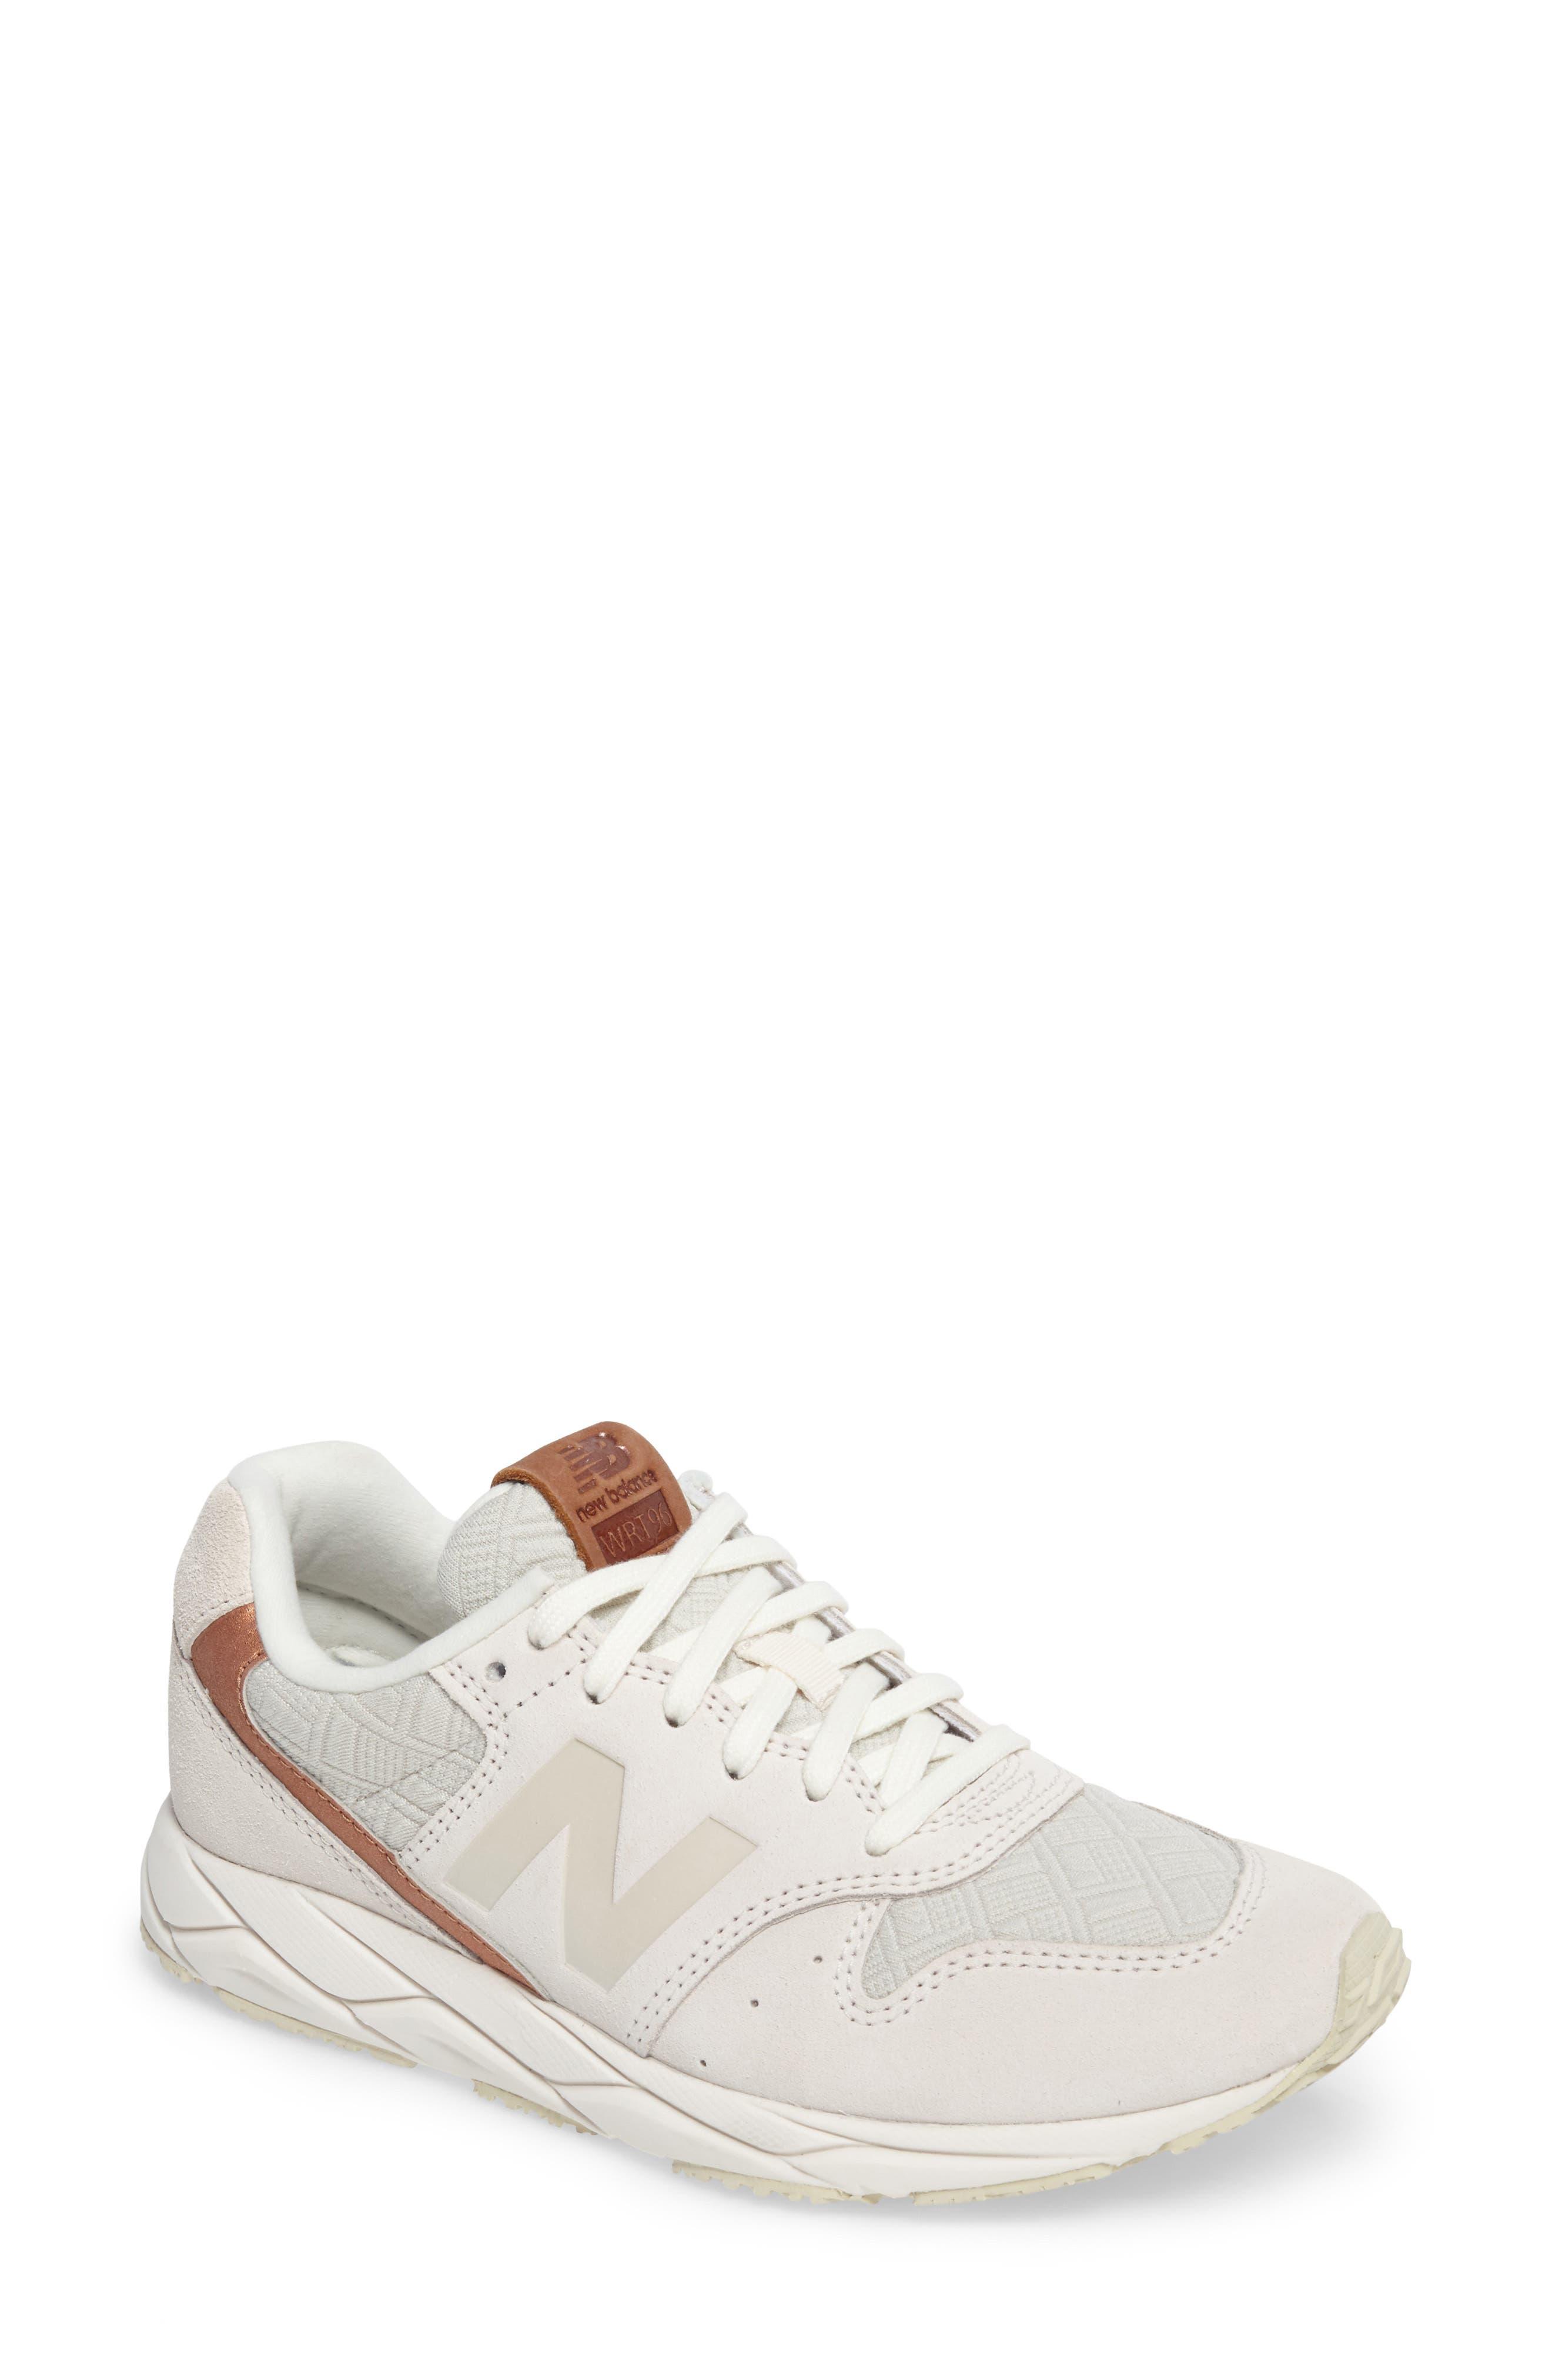 96 Mash-Up Sneaker,                         Main,                         color, 250